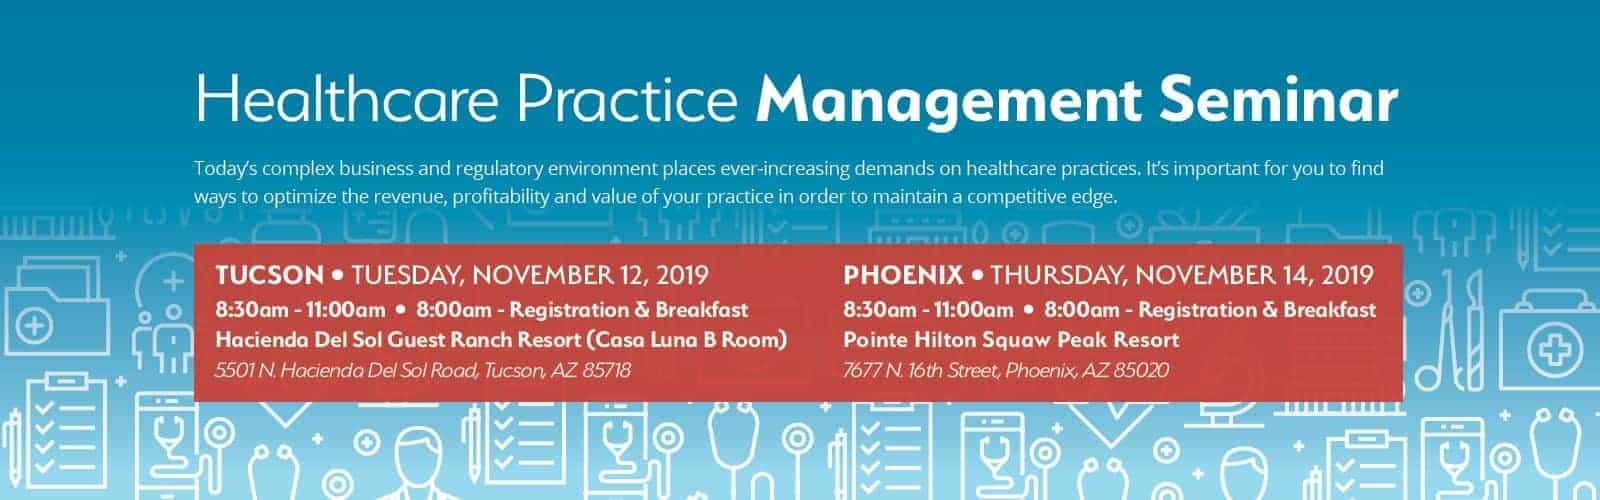 Healthcare Practice Management Seminar 2019